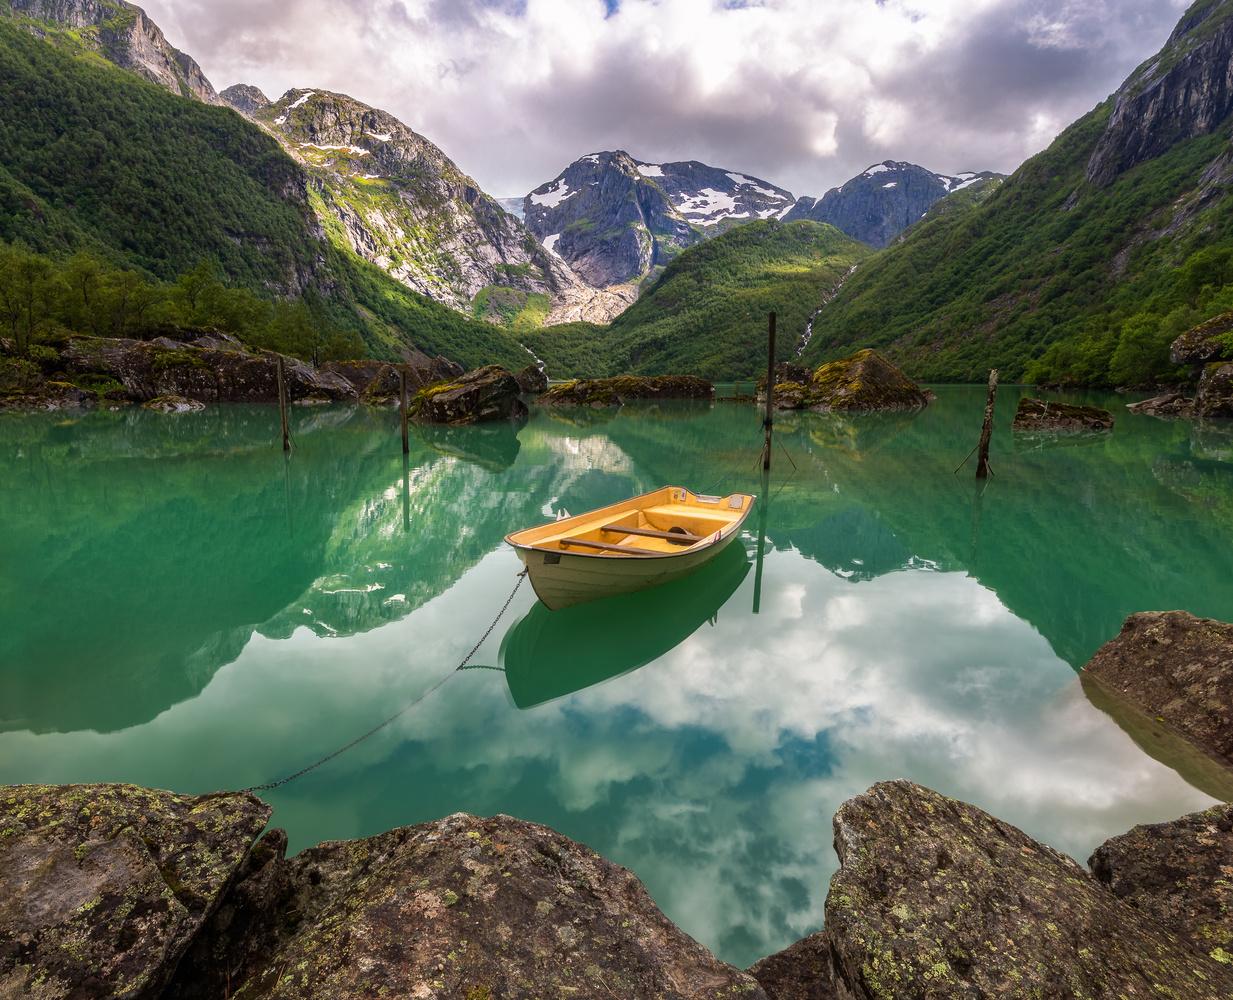 Bondhusvatnet by Mikkel Nordbæk